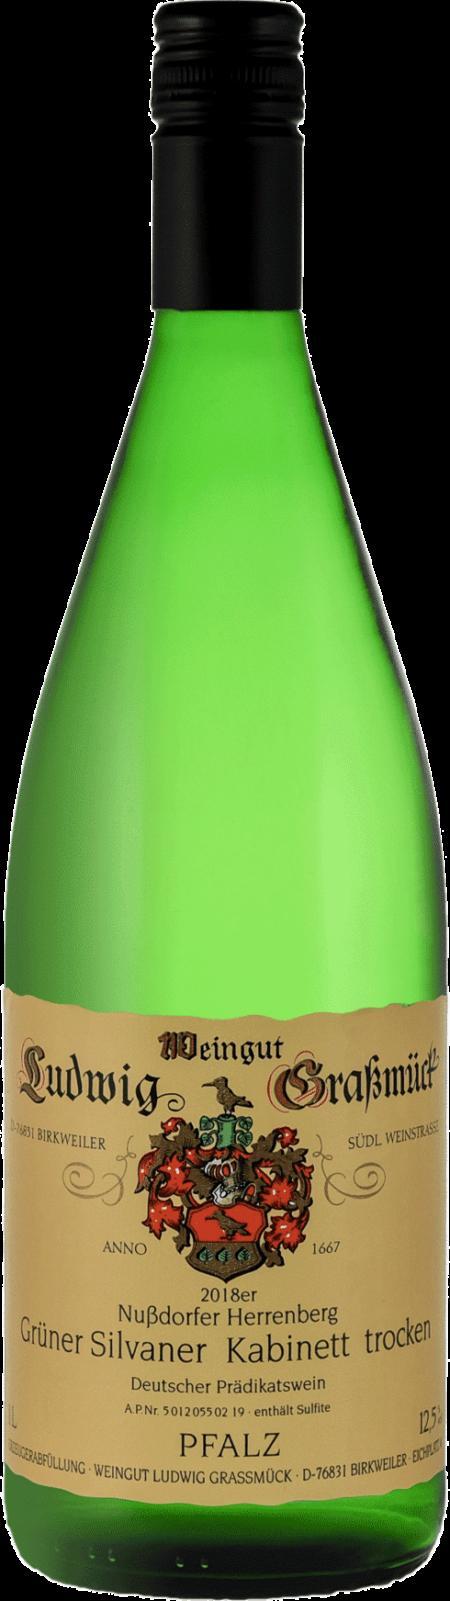 Weingut Ludwig Graßmück, Simon Graßmück, Grüner Silvaner Kabinett, trocken